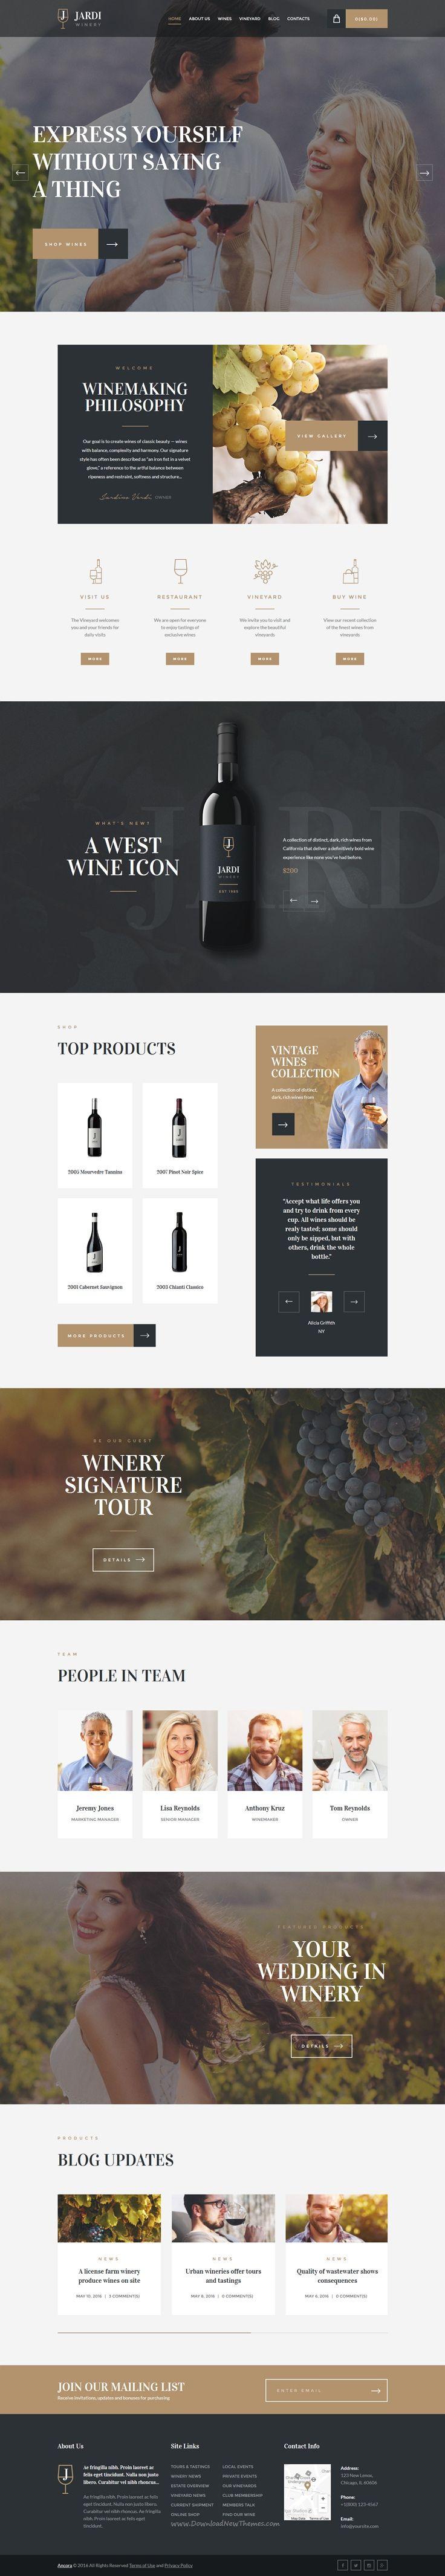 Jardi has modern and functional design premium #WordPress #theme perfectly suitable for #Vineyard, Winery & Wine Producer website download now➝ https://themeforest.net/item/jardi-winery-vineyard-wine-shop-wordpress-theme/16390279?ref=Datasata